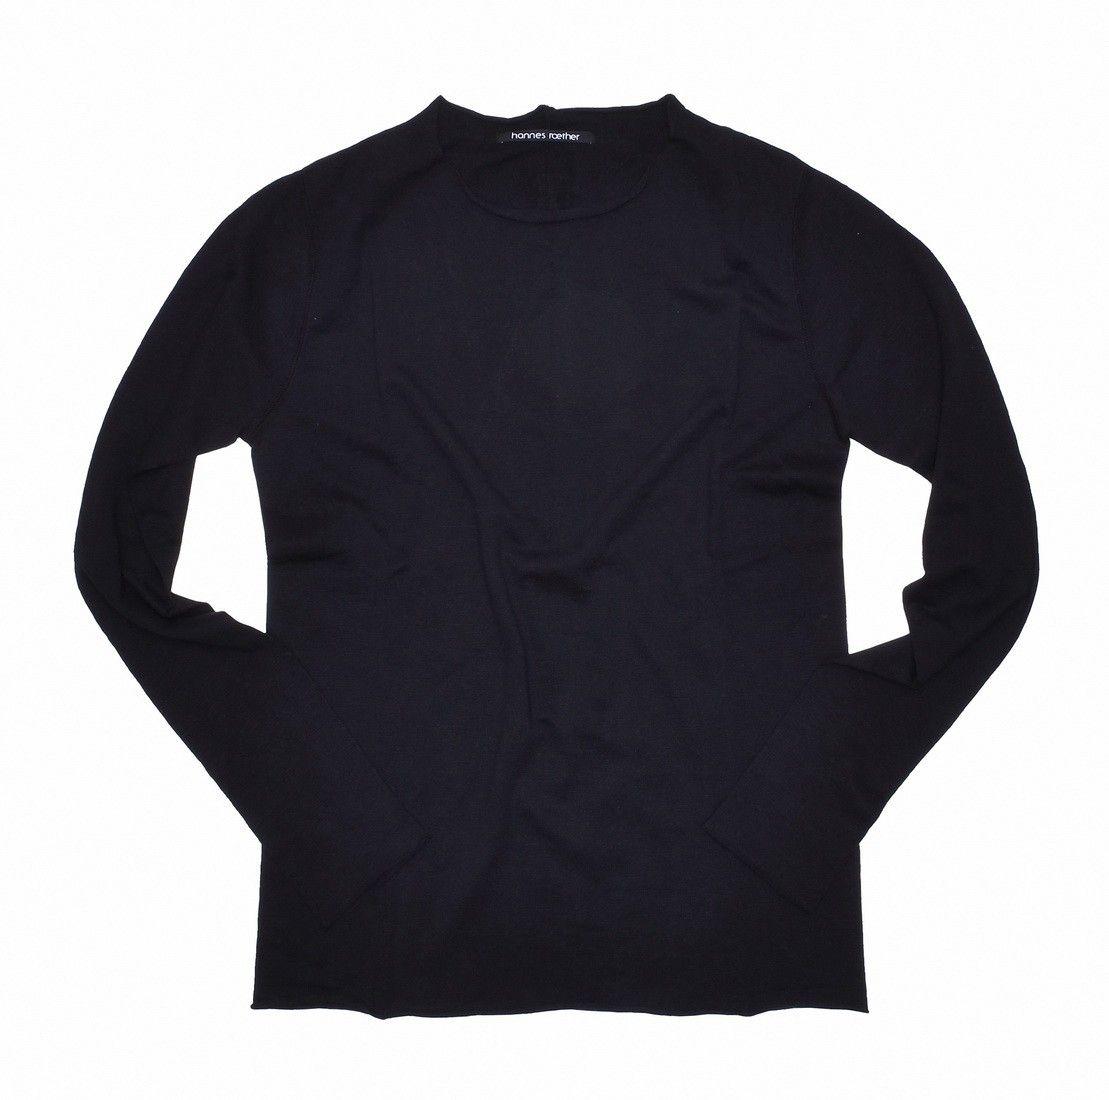 HANNES ROETHER - Herren Pullover Finte - Black